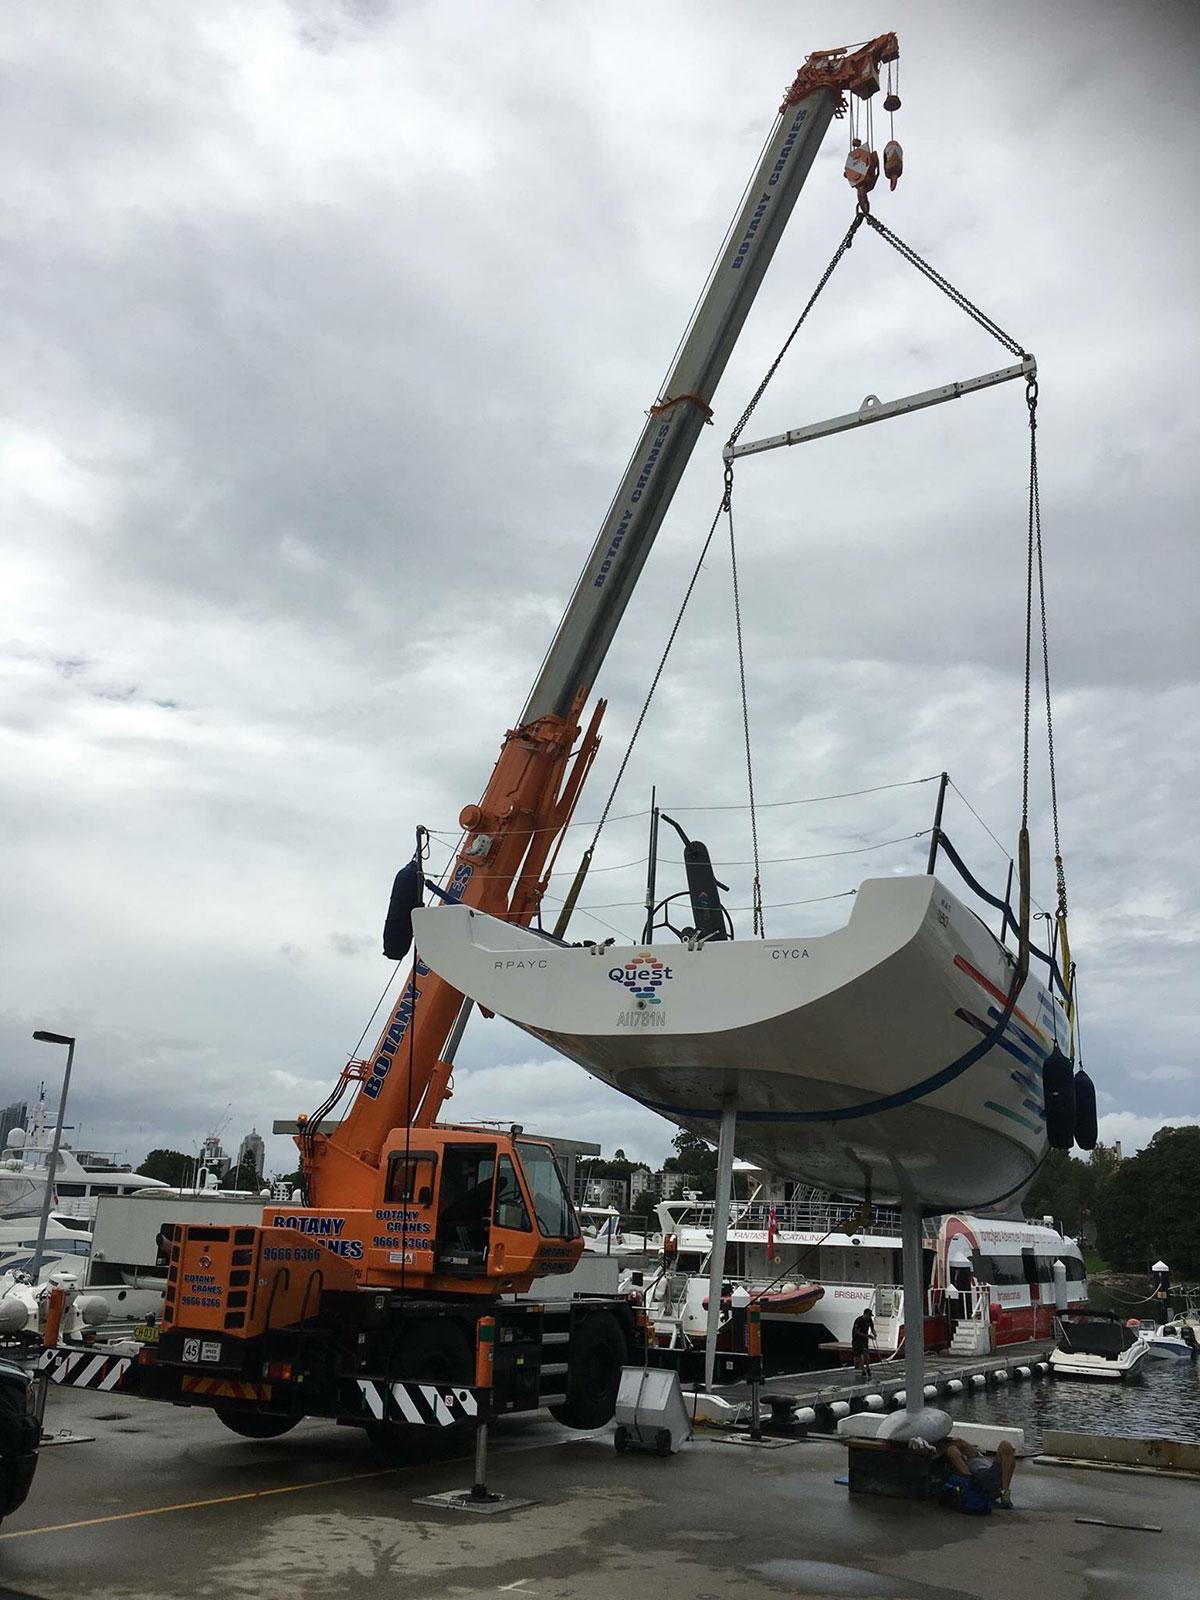 Botany Cranes 20 tonne crane boat lift